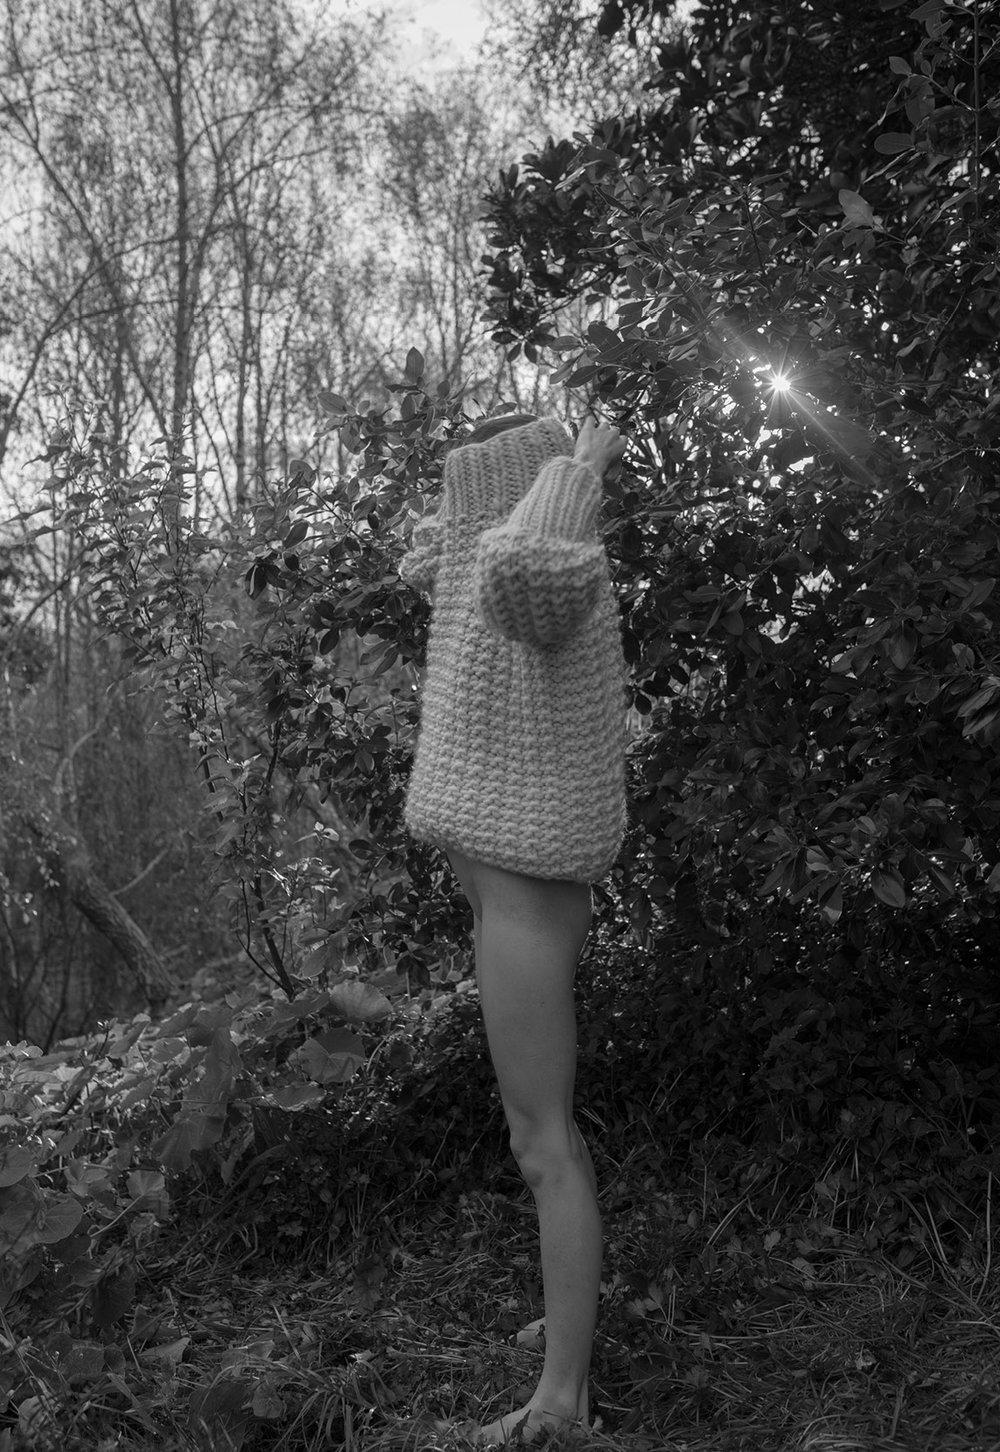 Nicole_Leybourne-Claire_Hart-P_Magazine-12.jpg